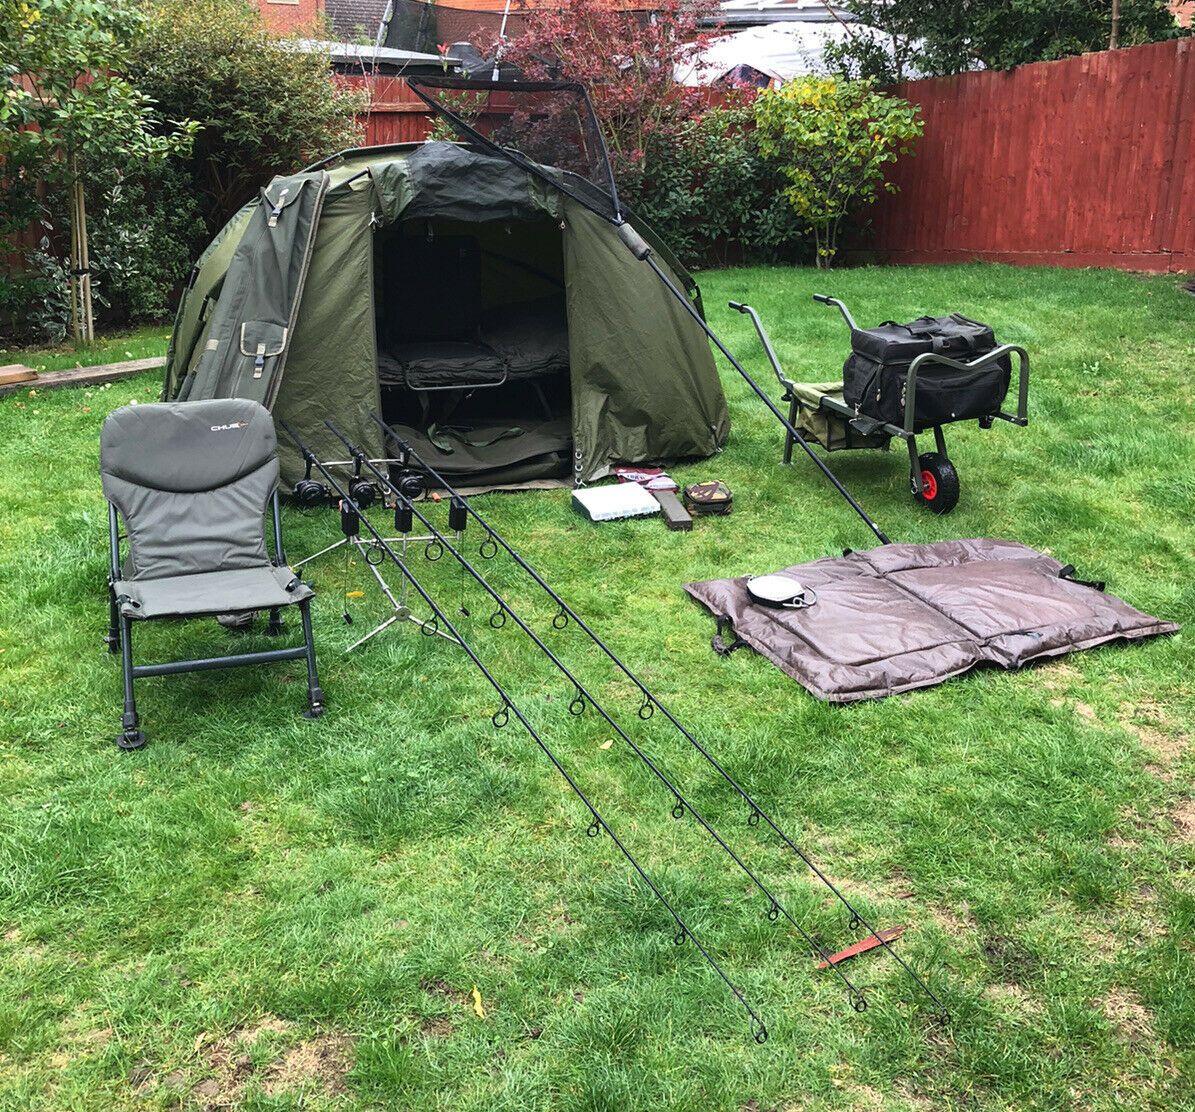 Ad - Carp Fishing Complete Set Up On eBay here -->> https://t.co/5YYVA0Oxc6  #carpfishing http